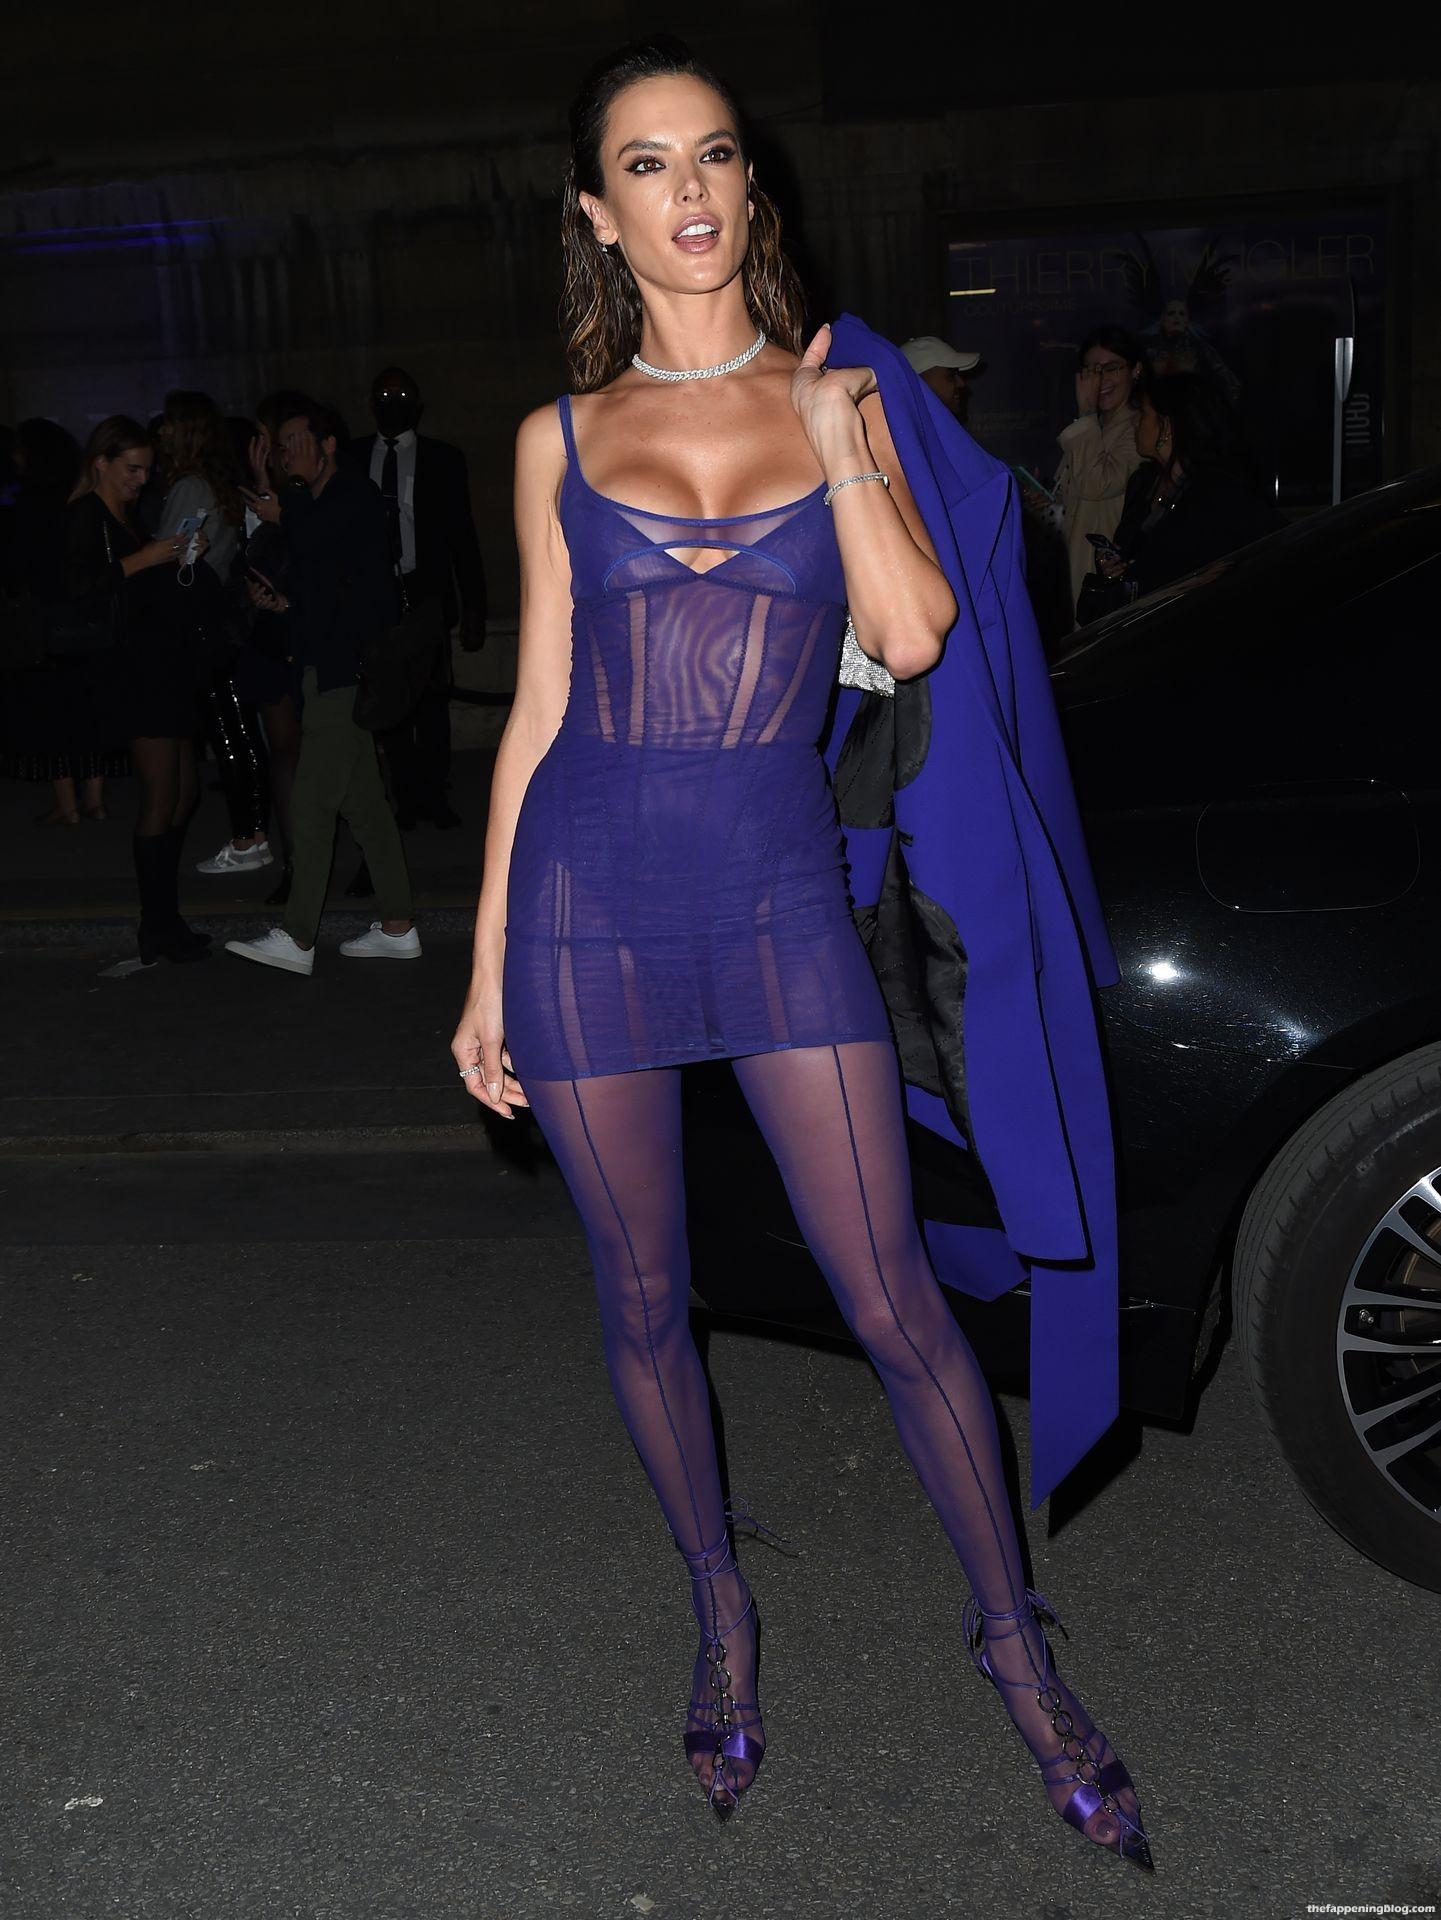 Alessandra-Ambrosio-Sexy-The-Fappening-Blog-27-3.jpg